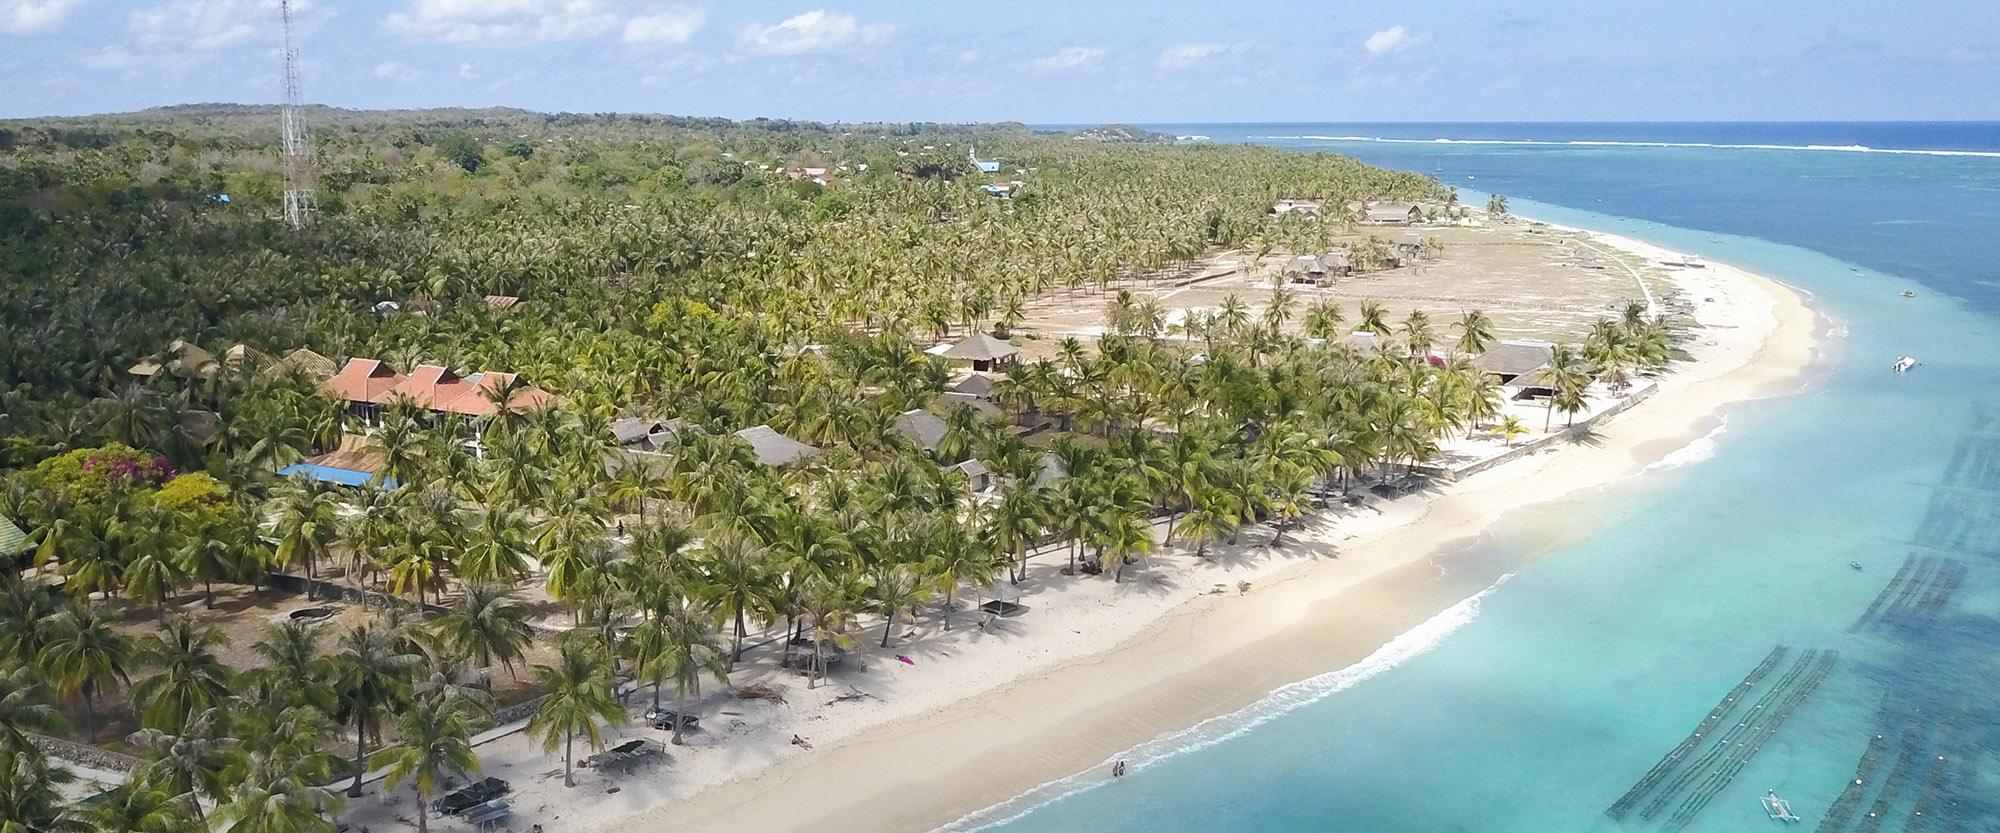 palmtrees water ocean see nemberala beach anugerah hotel indonesia rote island